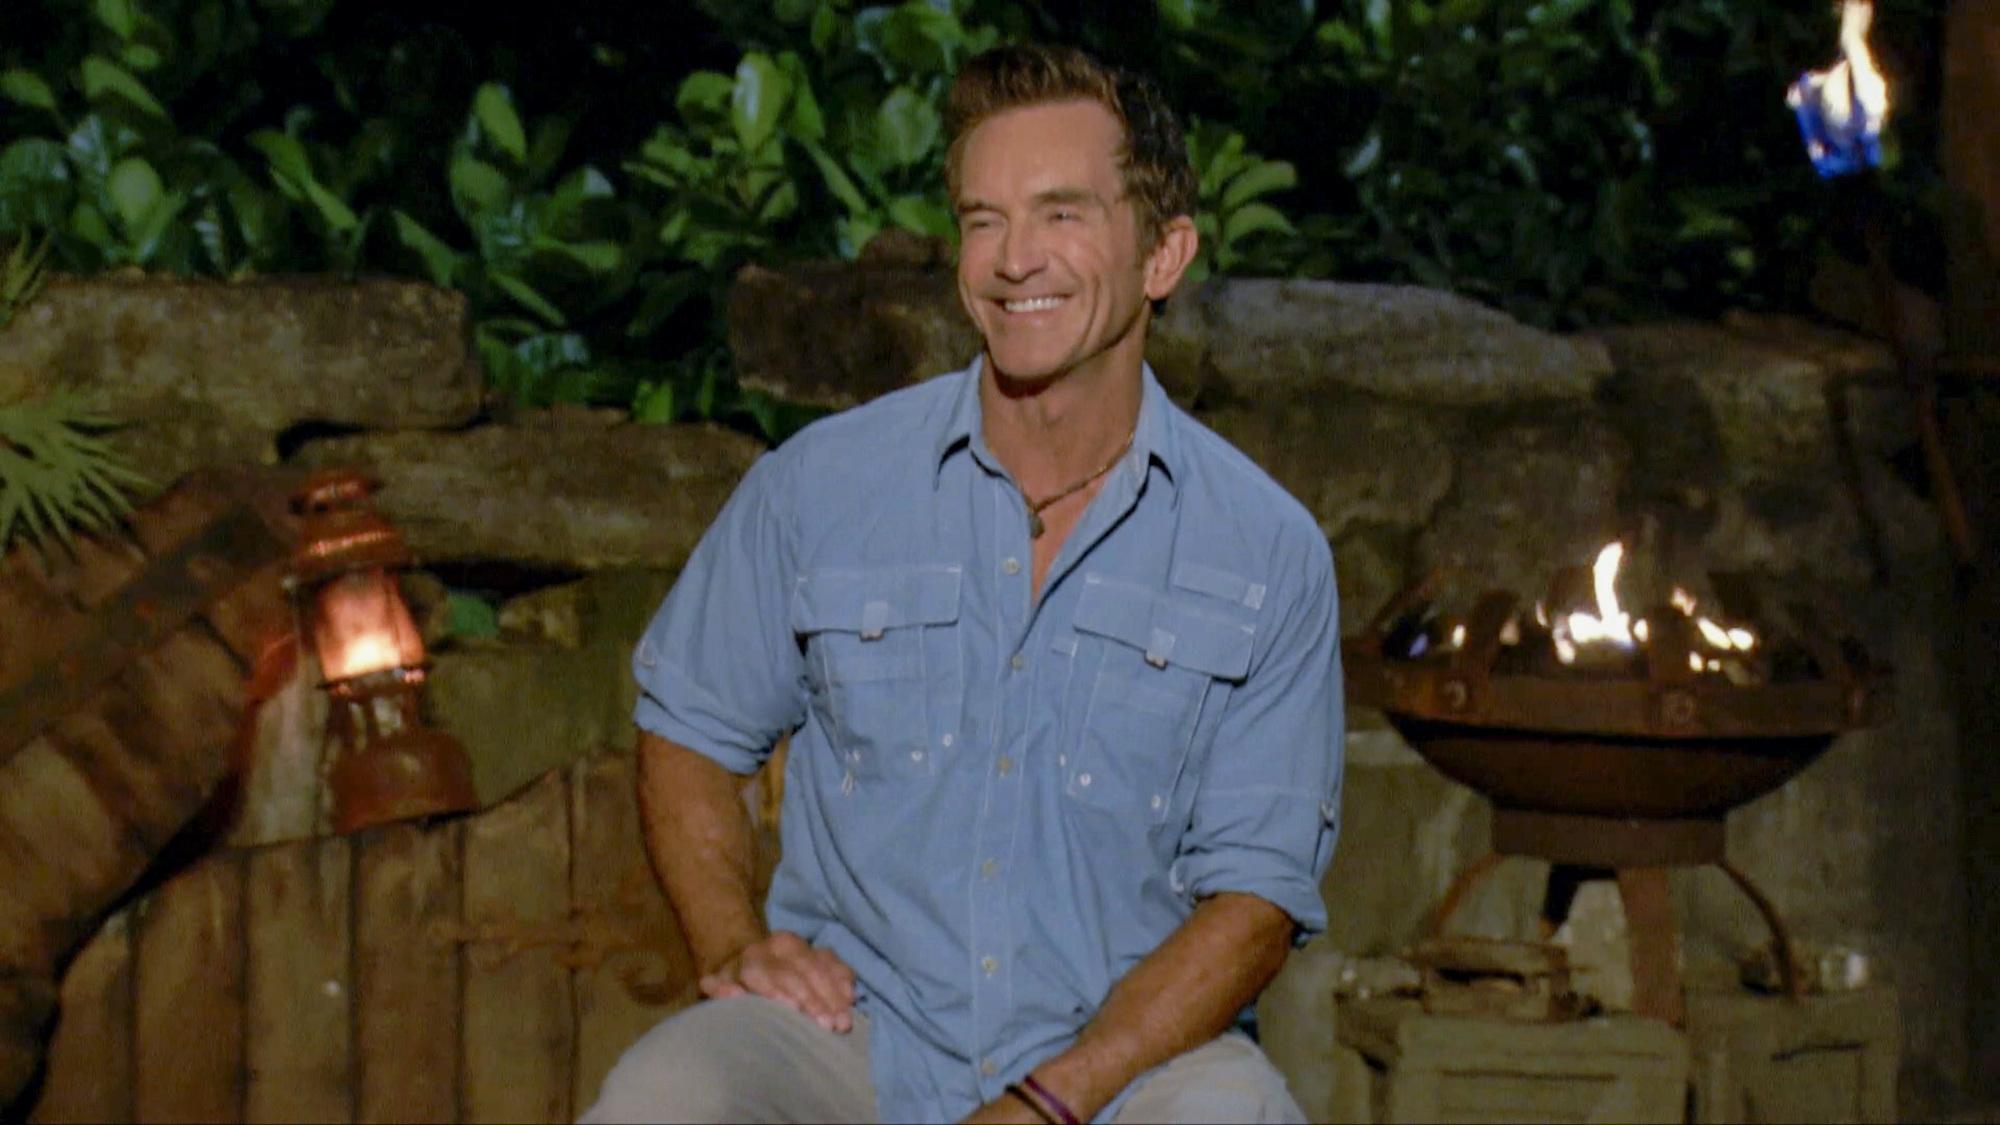 'Survivor 41' host Jeff Probst